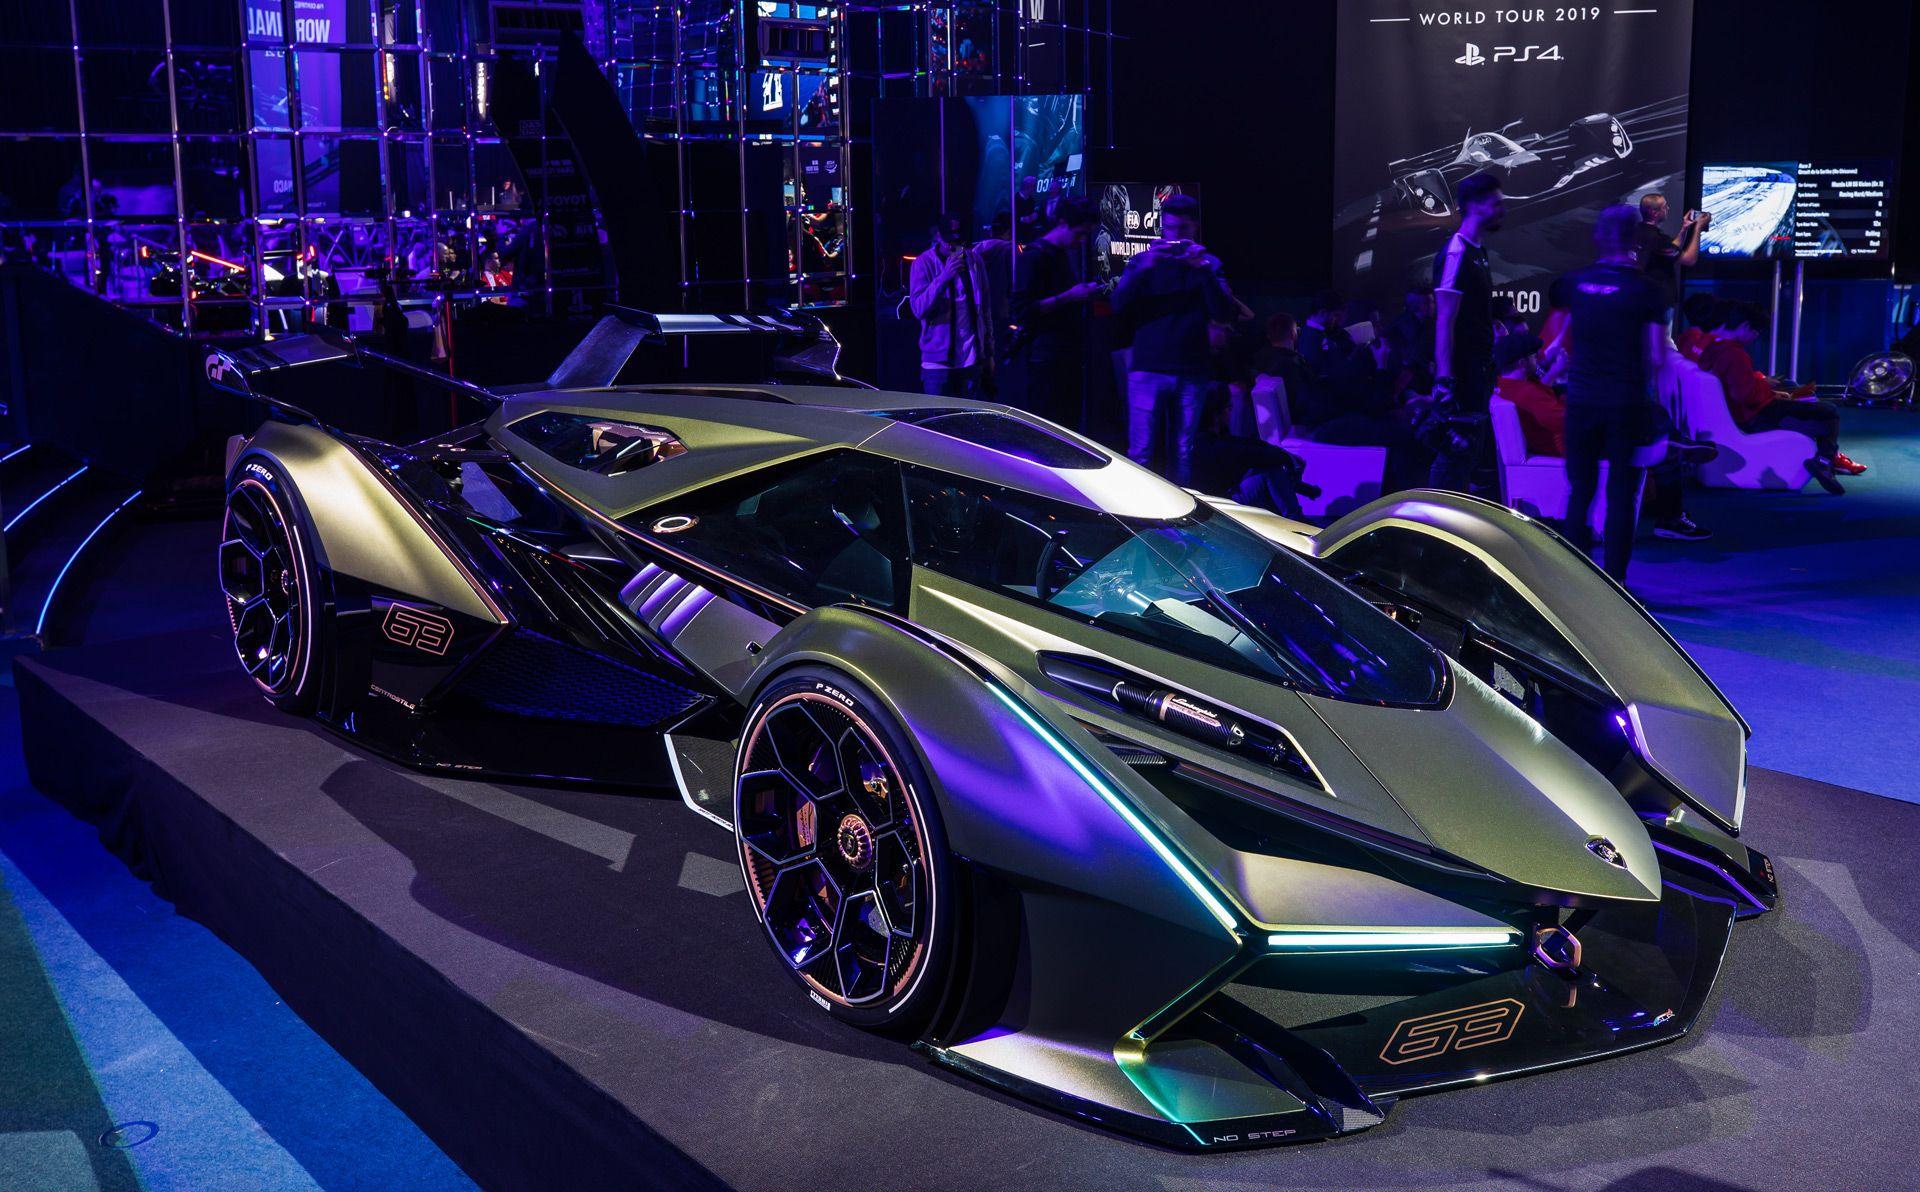 Lamborghini S Vision Gran Turismo Concept Packs A Hybrid V 12 Powertrain That Should Help The Car Deliver Formula One In 2020 Lambo Lamborghini Sports Cars Lamborghini